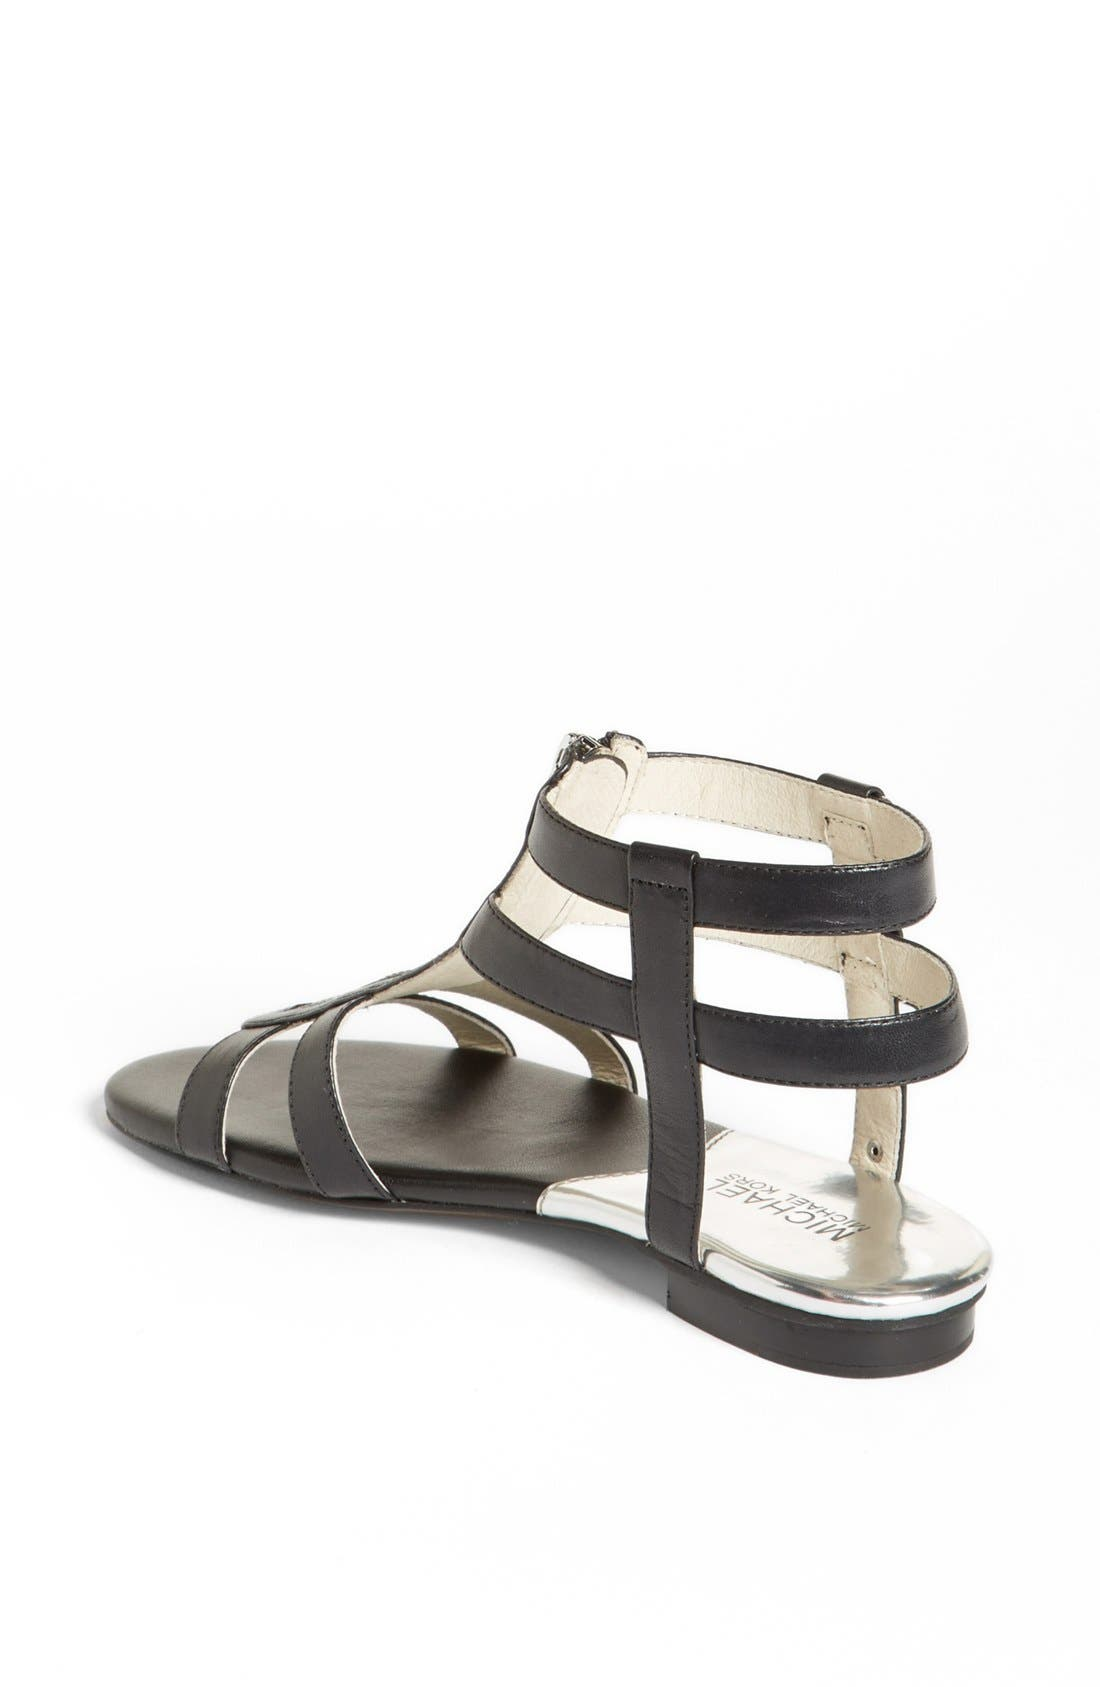 Alternate Image 2  - MICHAEL Michael Kors 'Kennedy' Flat Leather Gladiator Sandal